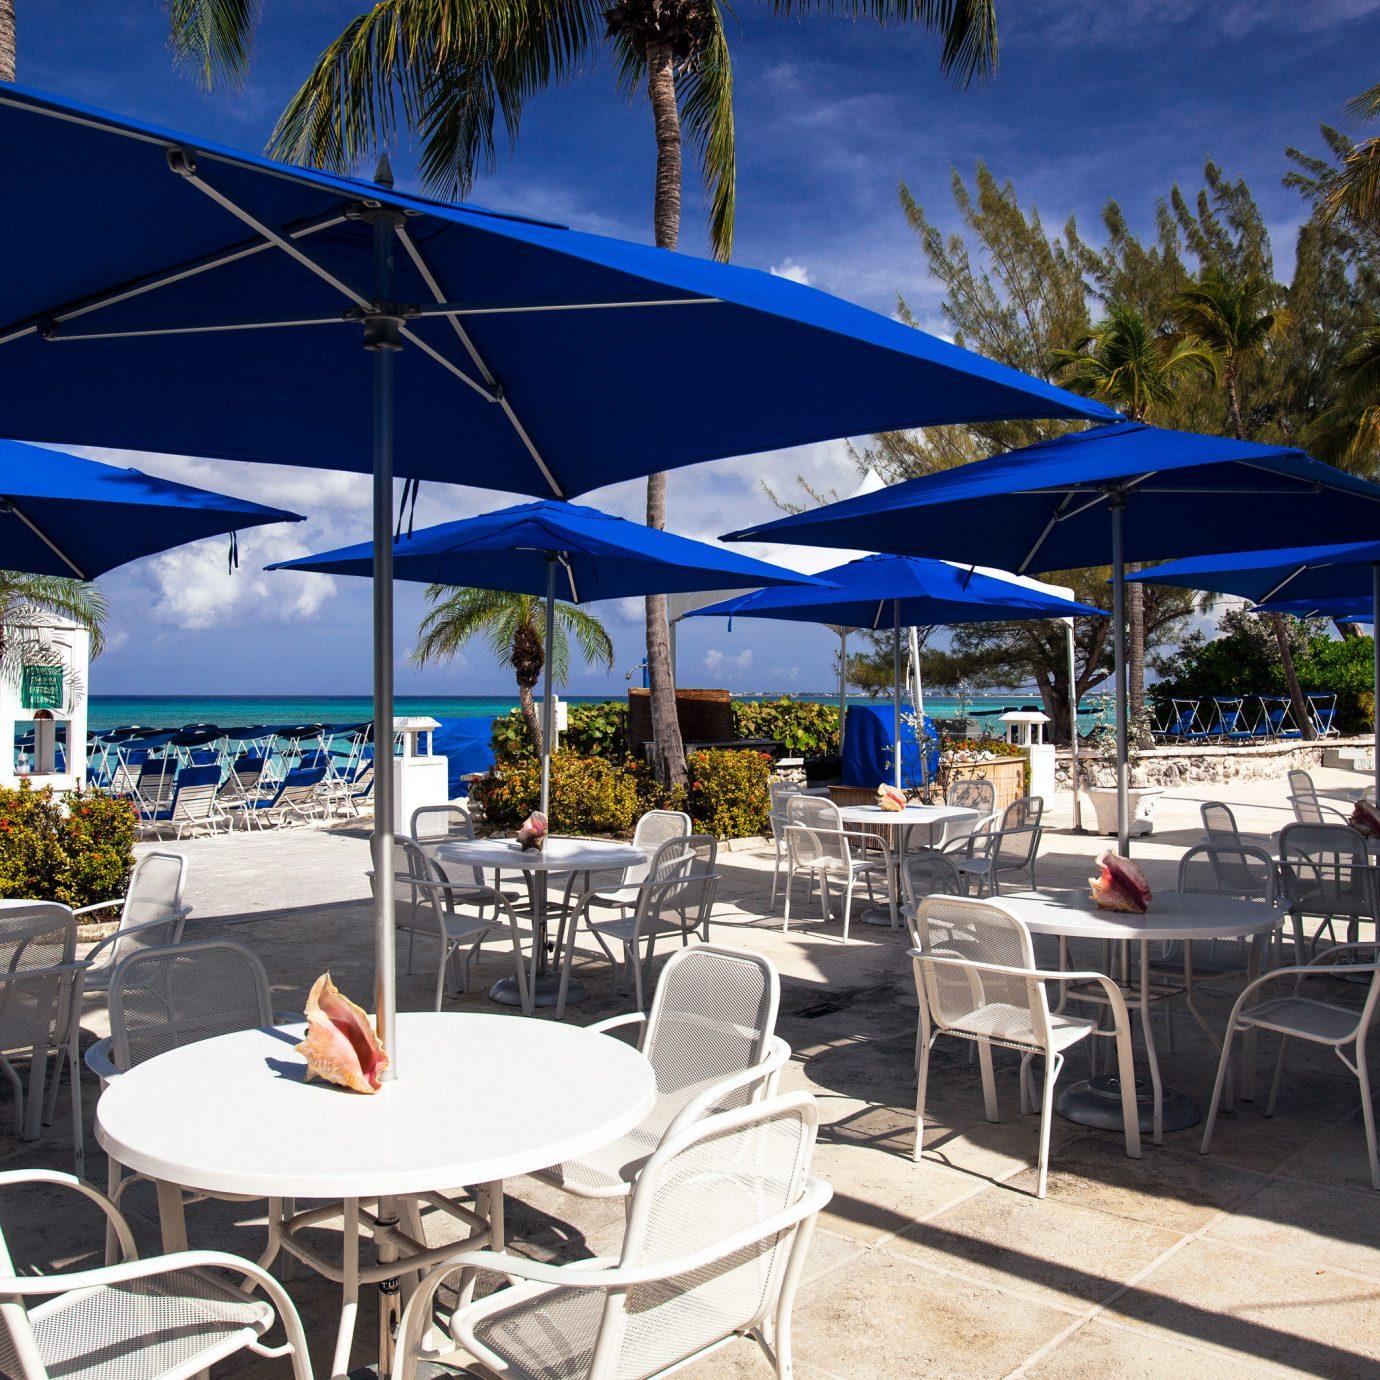 Beach Deck Dining Drink Eat Modern Outdoors tree umbrella chair restaurant Resort vehicle caribbean lawn marina blue set shade day